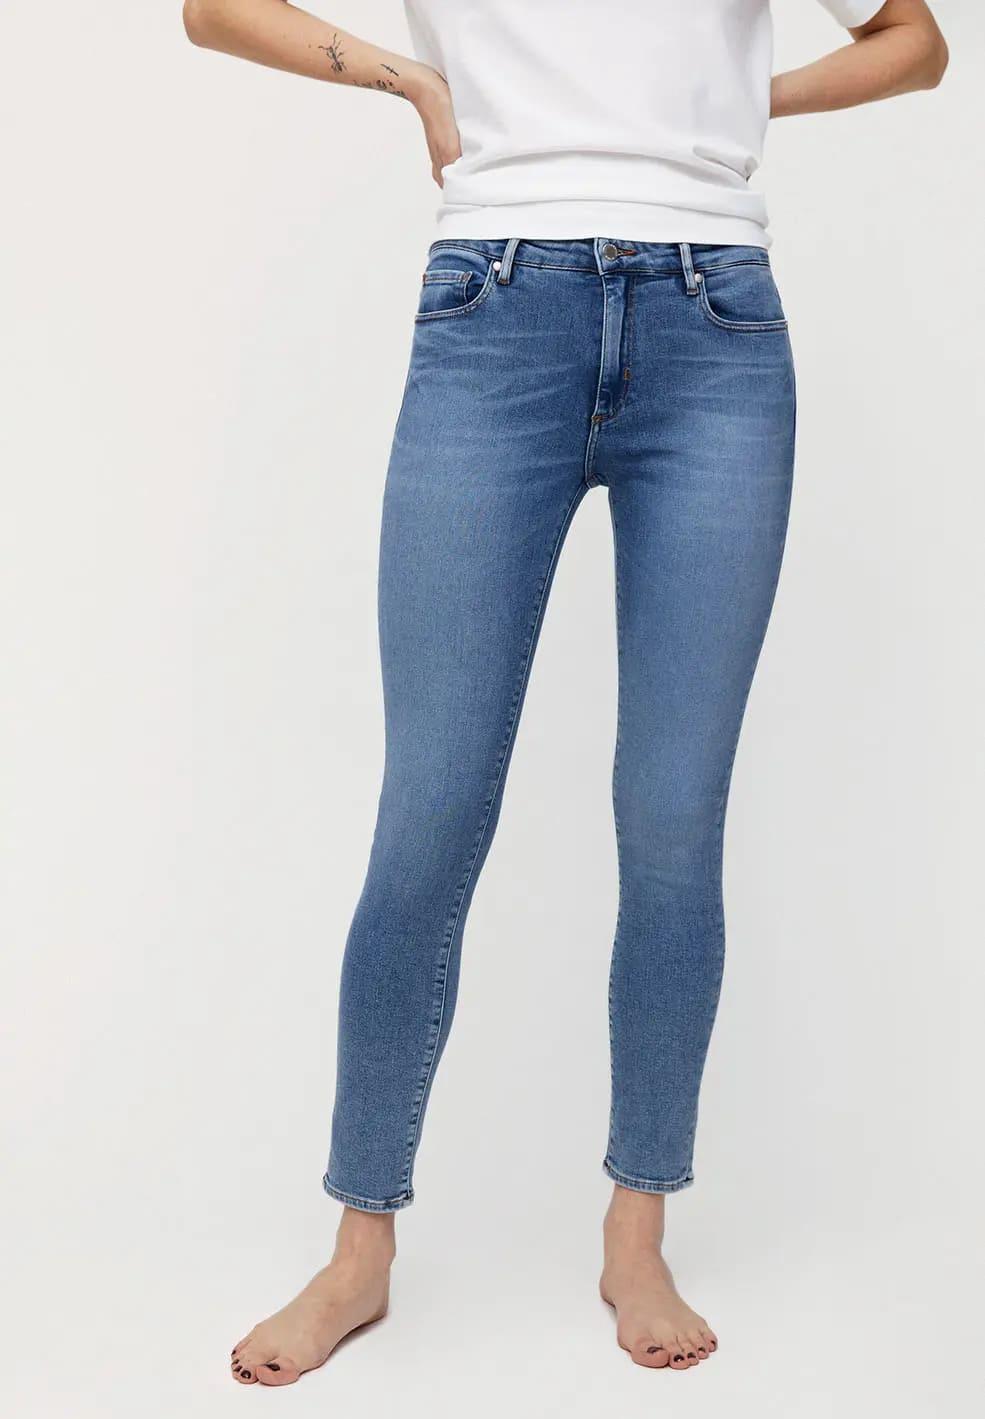 skinny Jeans Tillaa stretch von Armedangels in sky blue